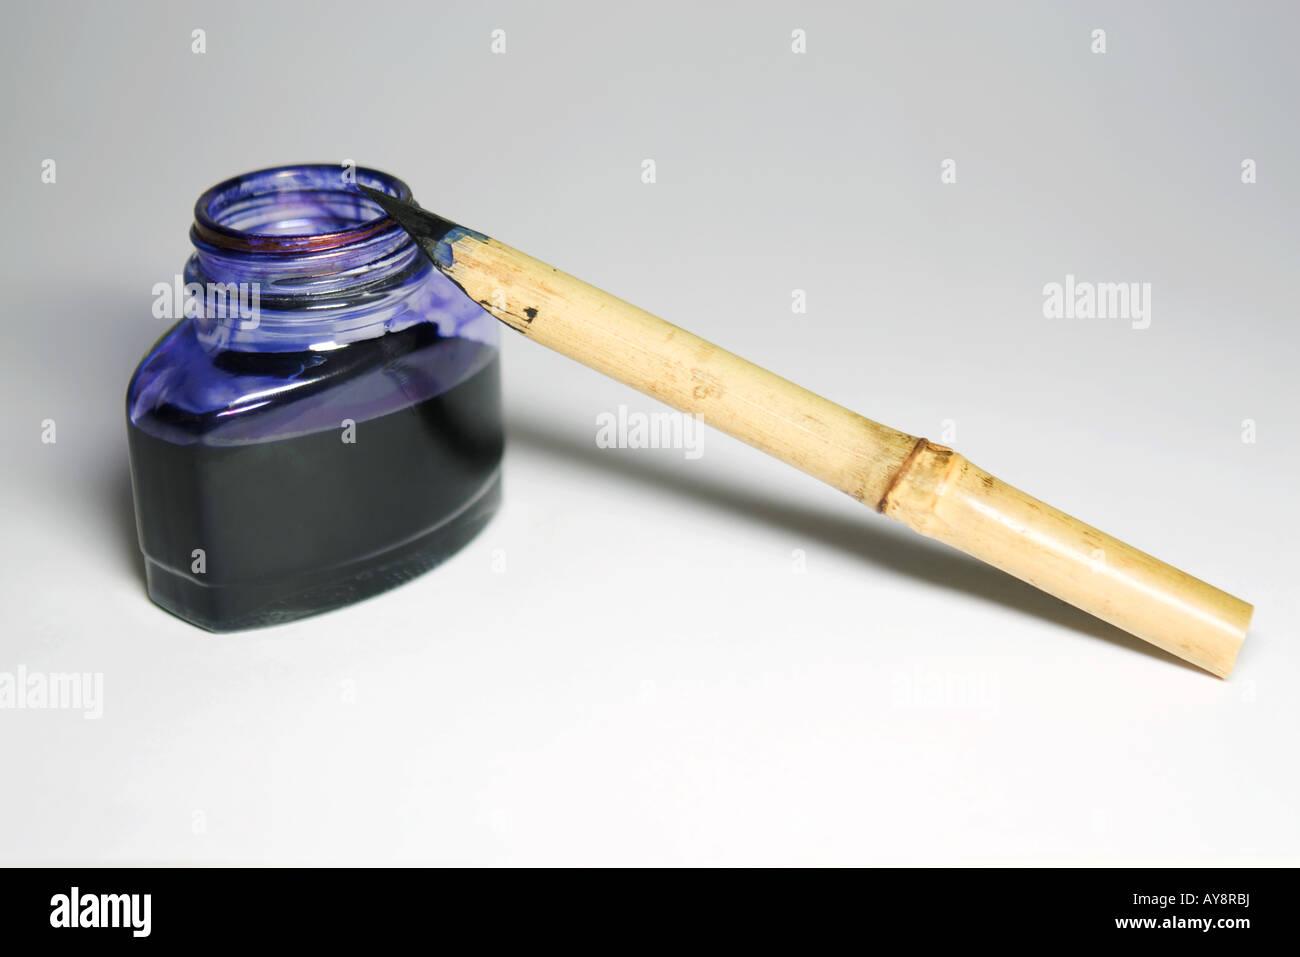 Reed pen and bottle of indigo ink, close-up Stock Photo